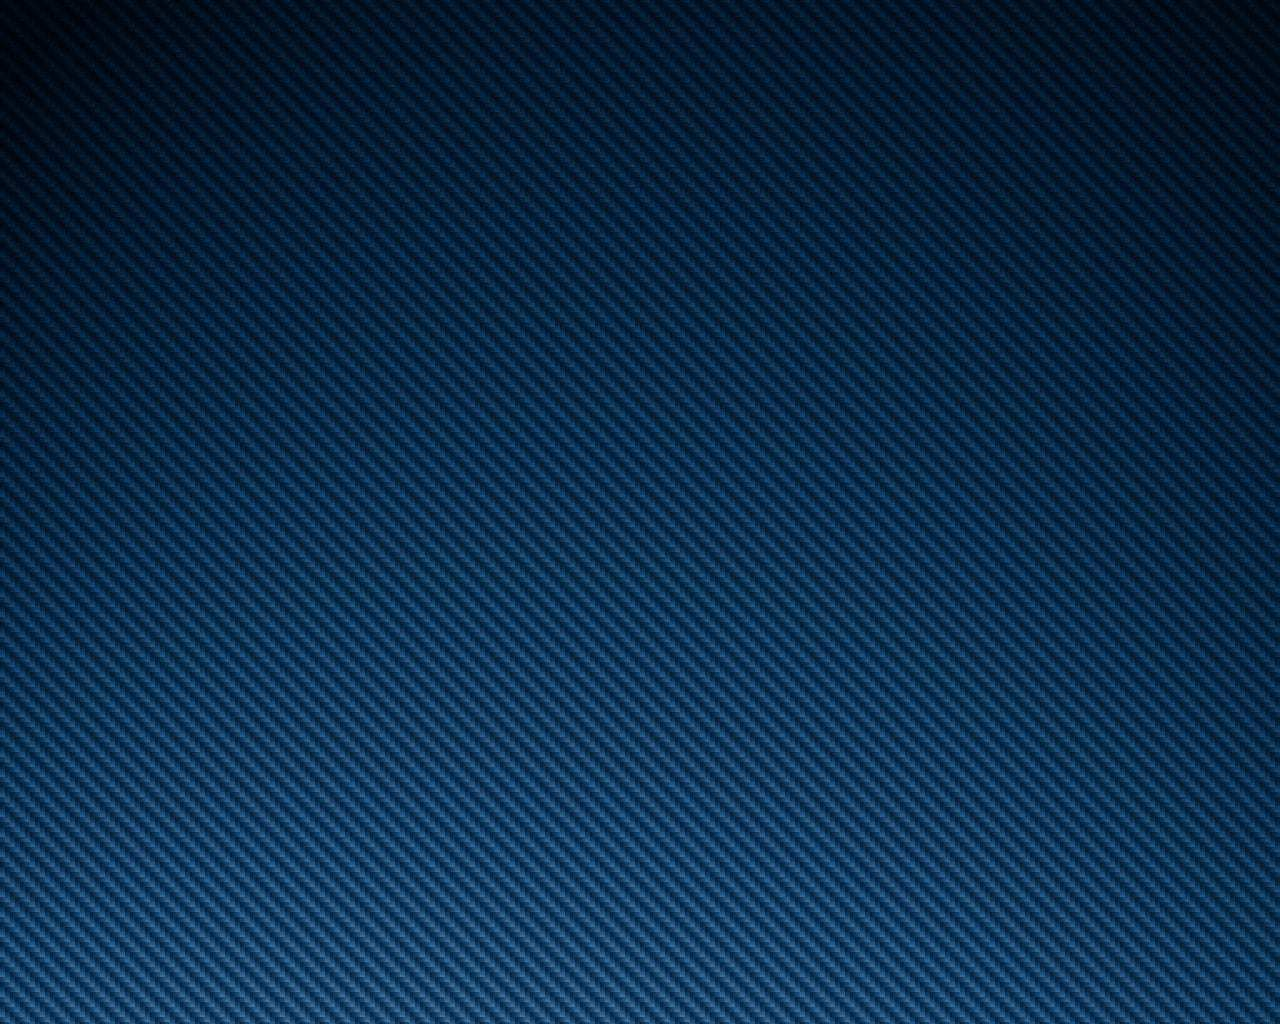 Blue-Carbon-Fiber-Texture